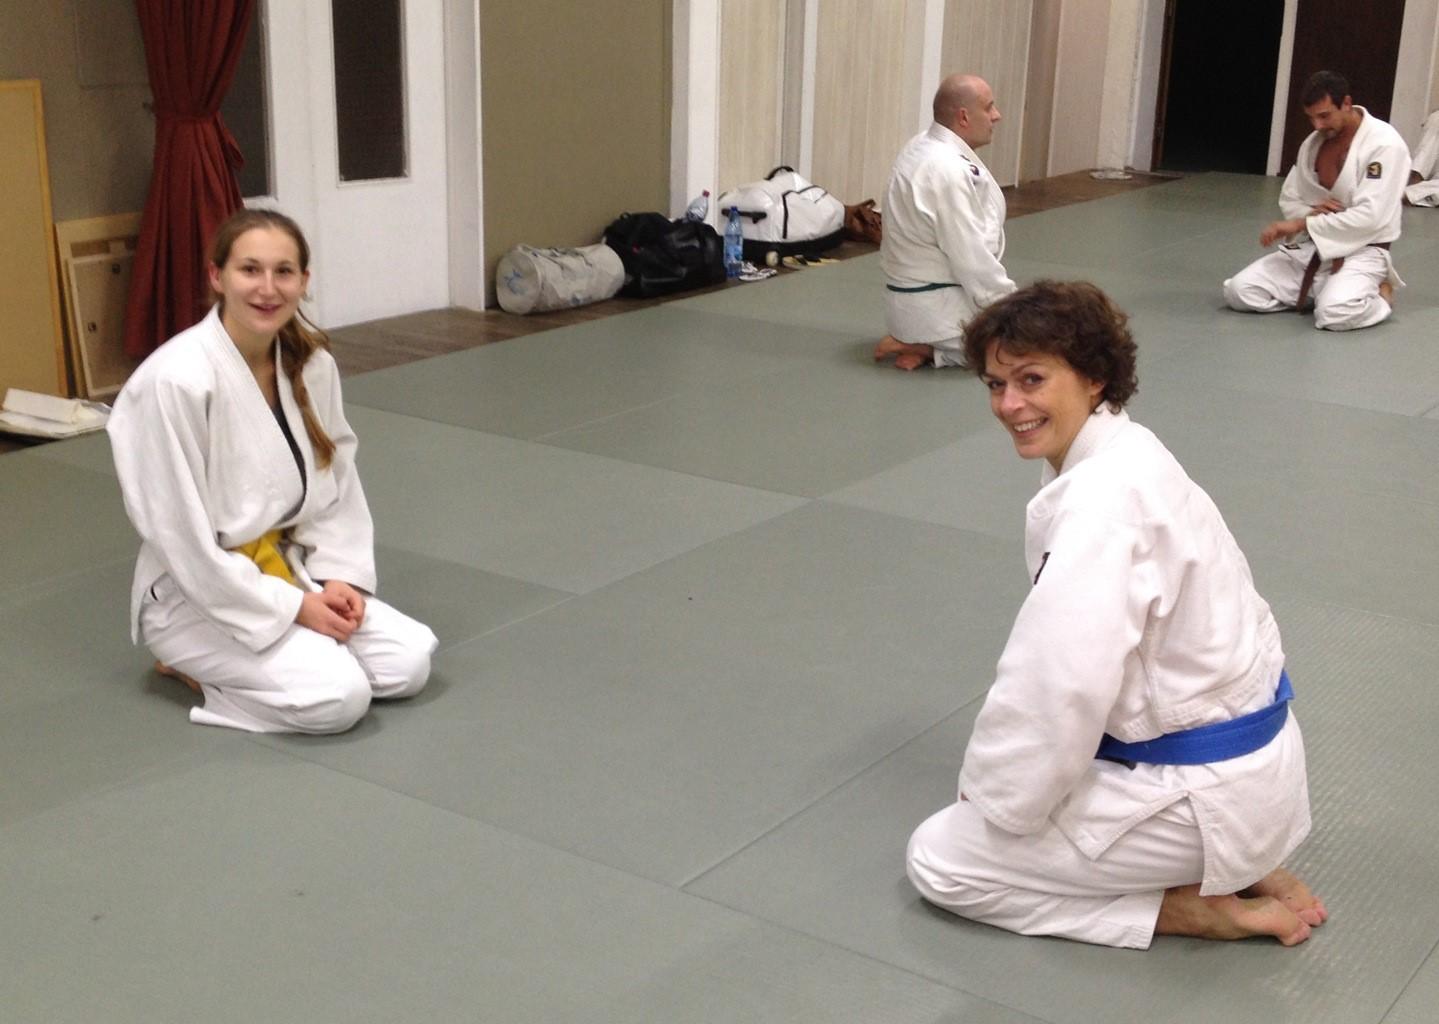 jujitsu-efjjsd-novembre-2013 10